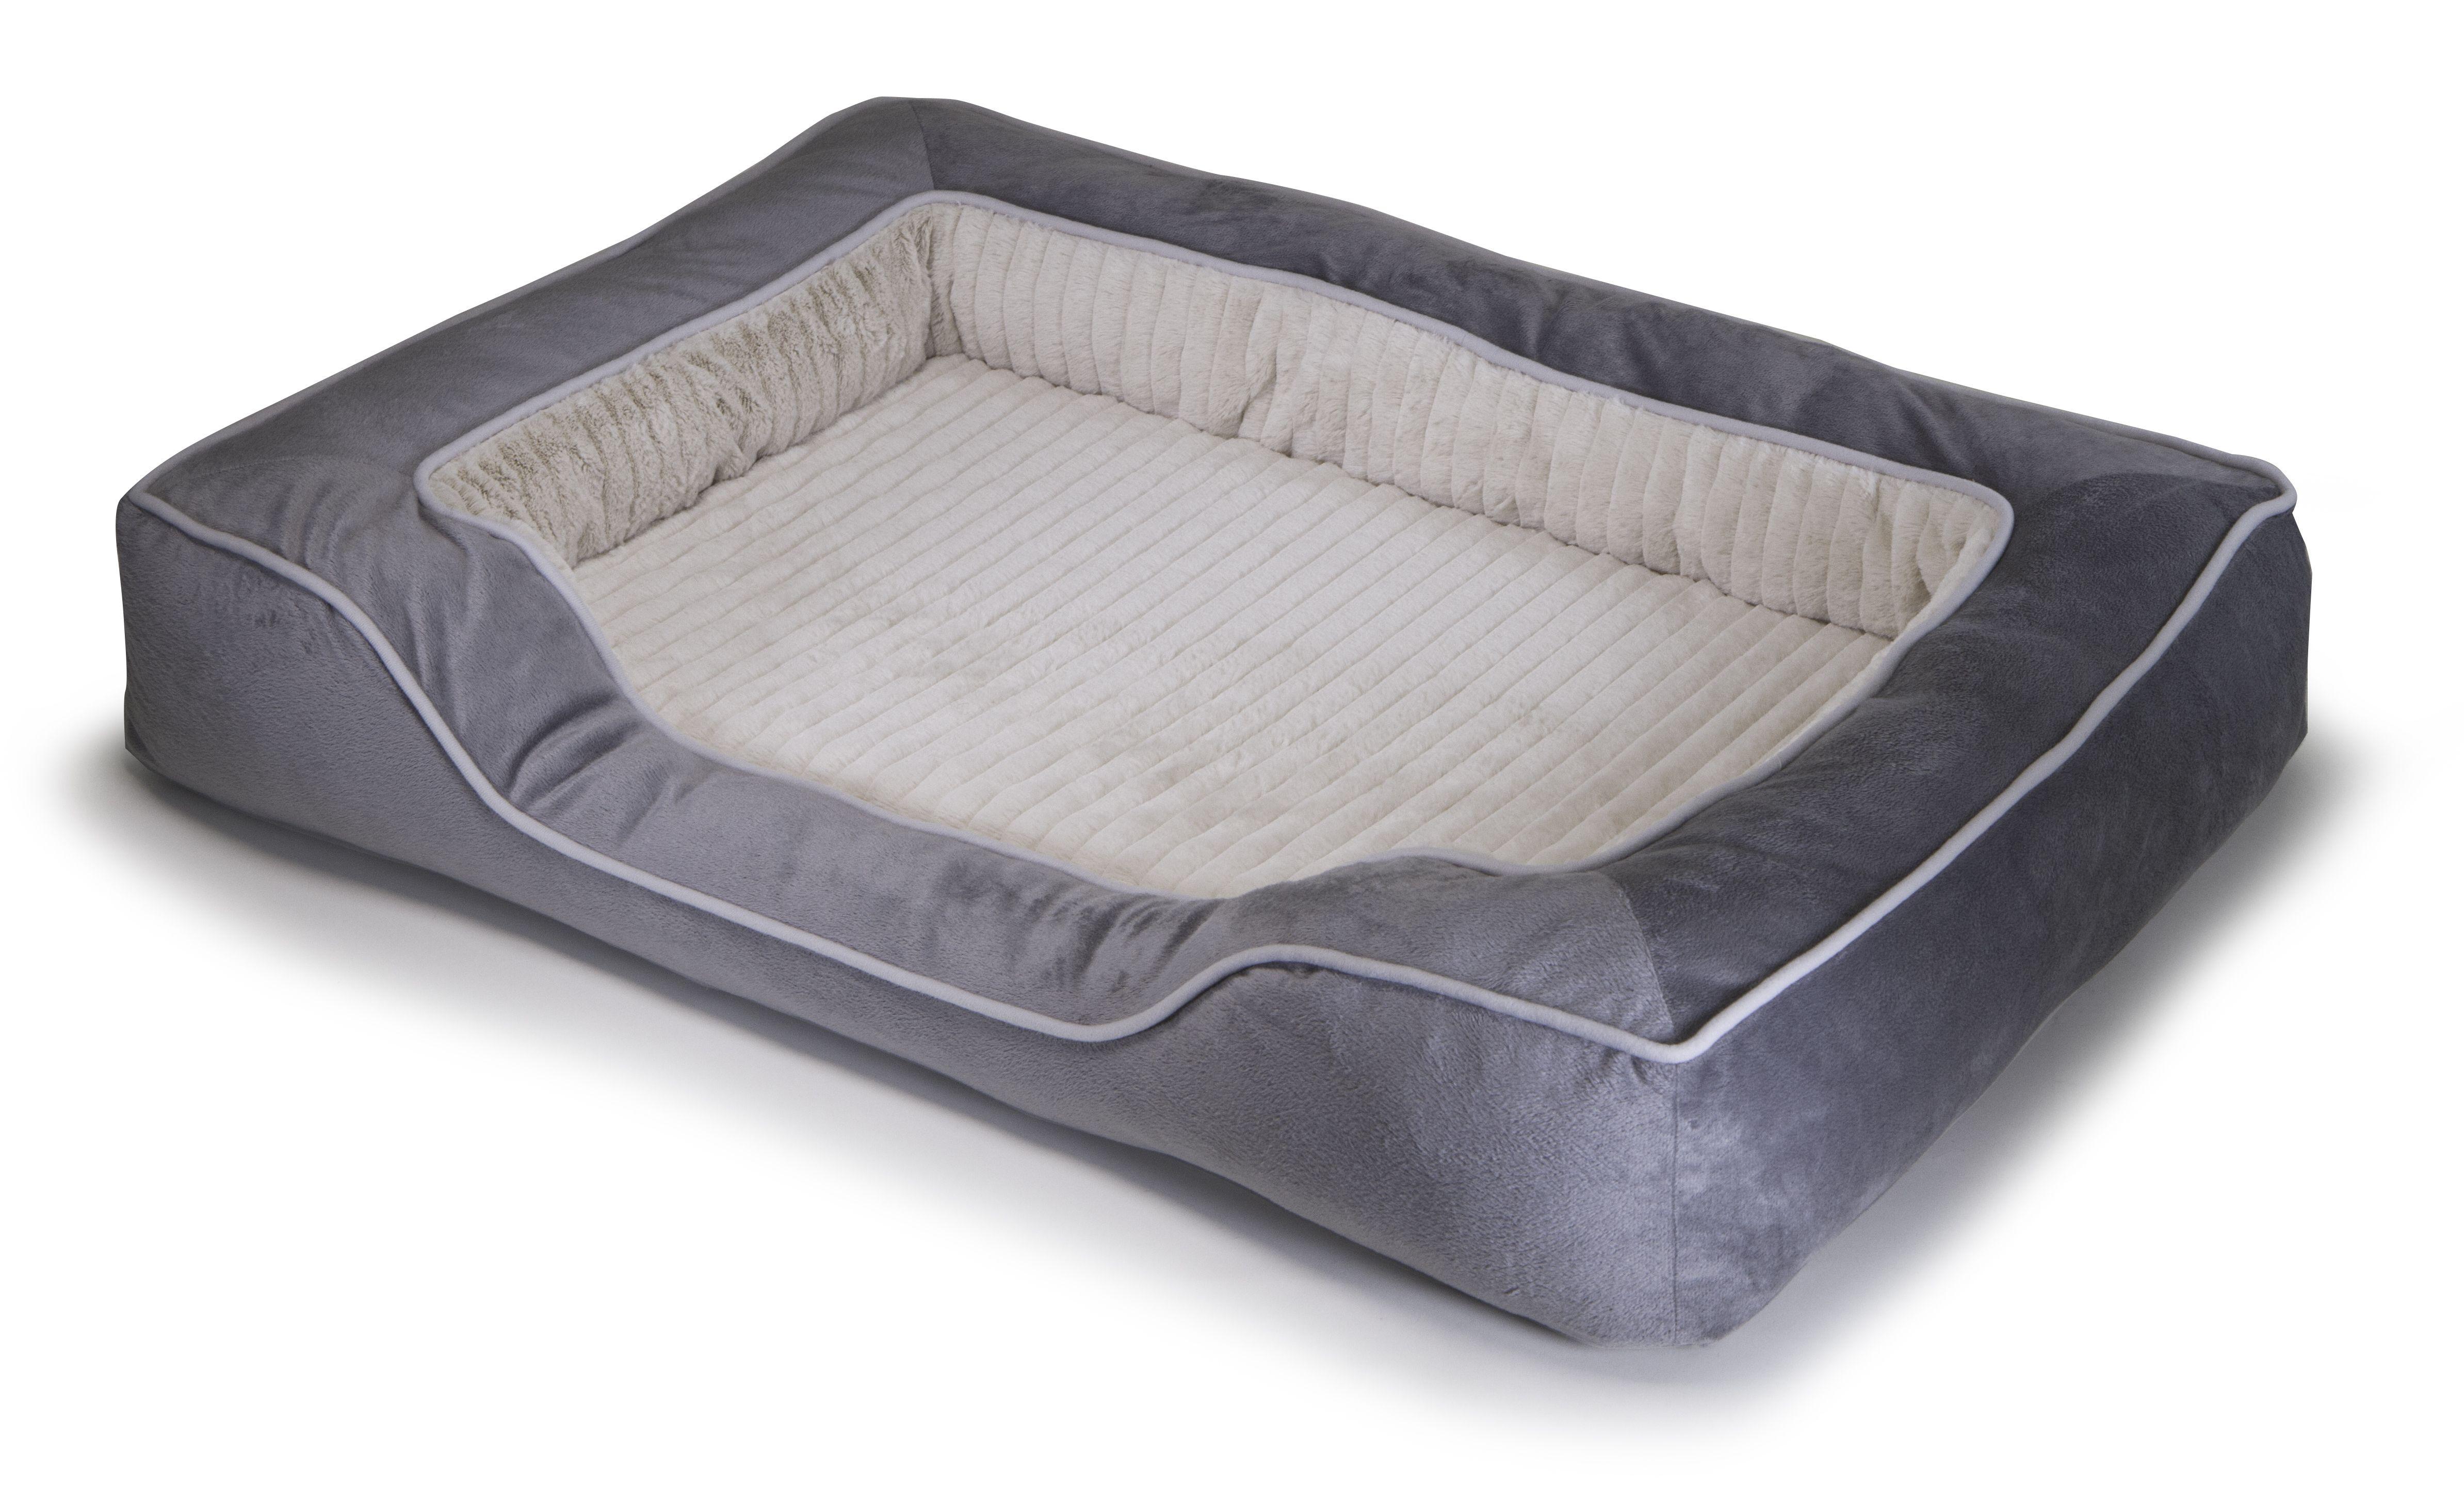 sensi sofa orthopedic bedtrustypup   pet products-2016   pinterest